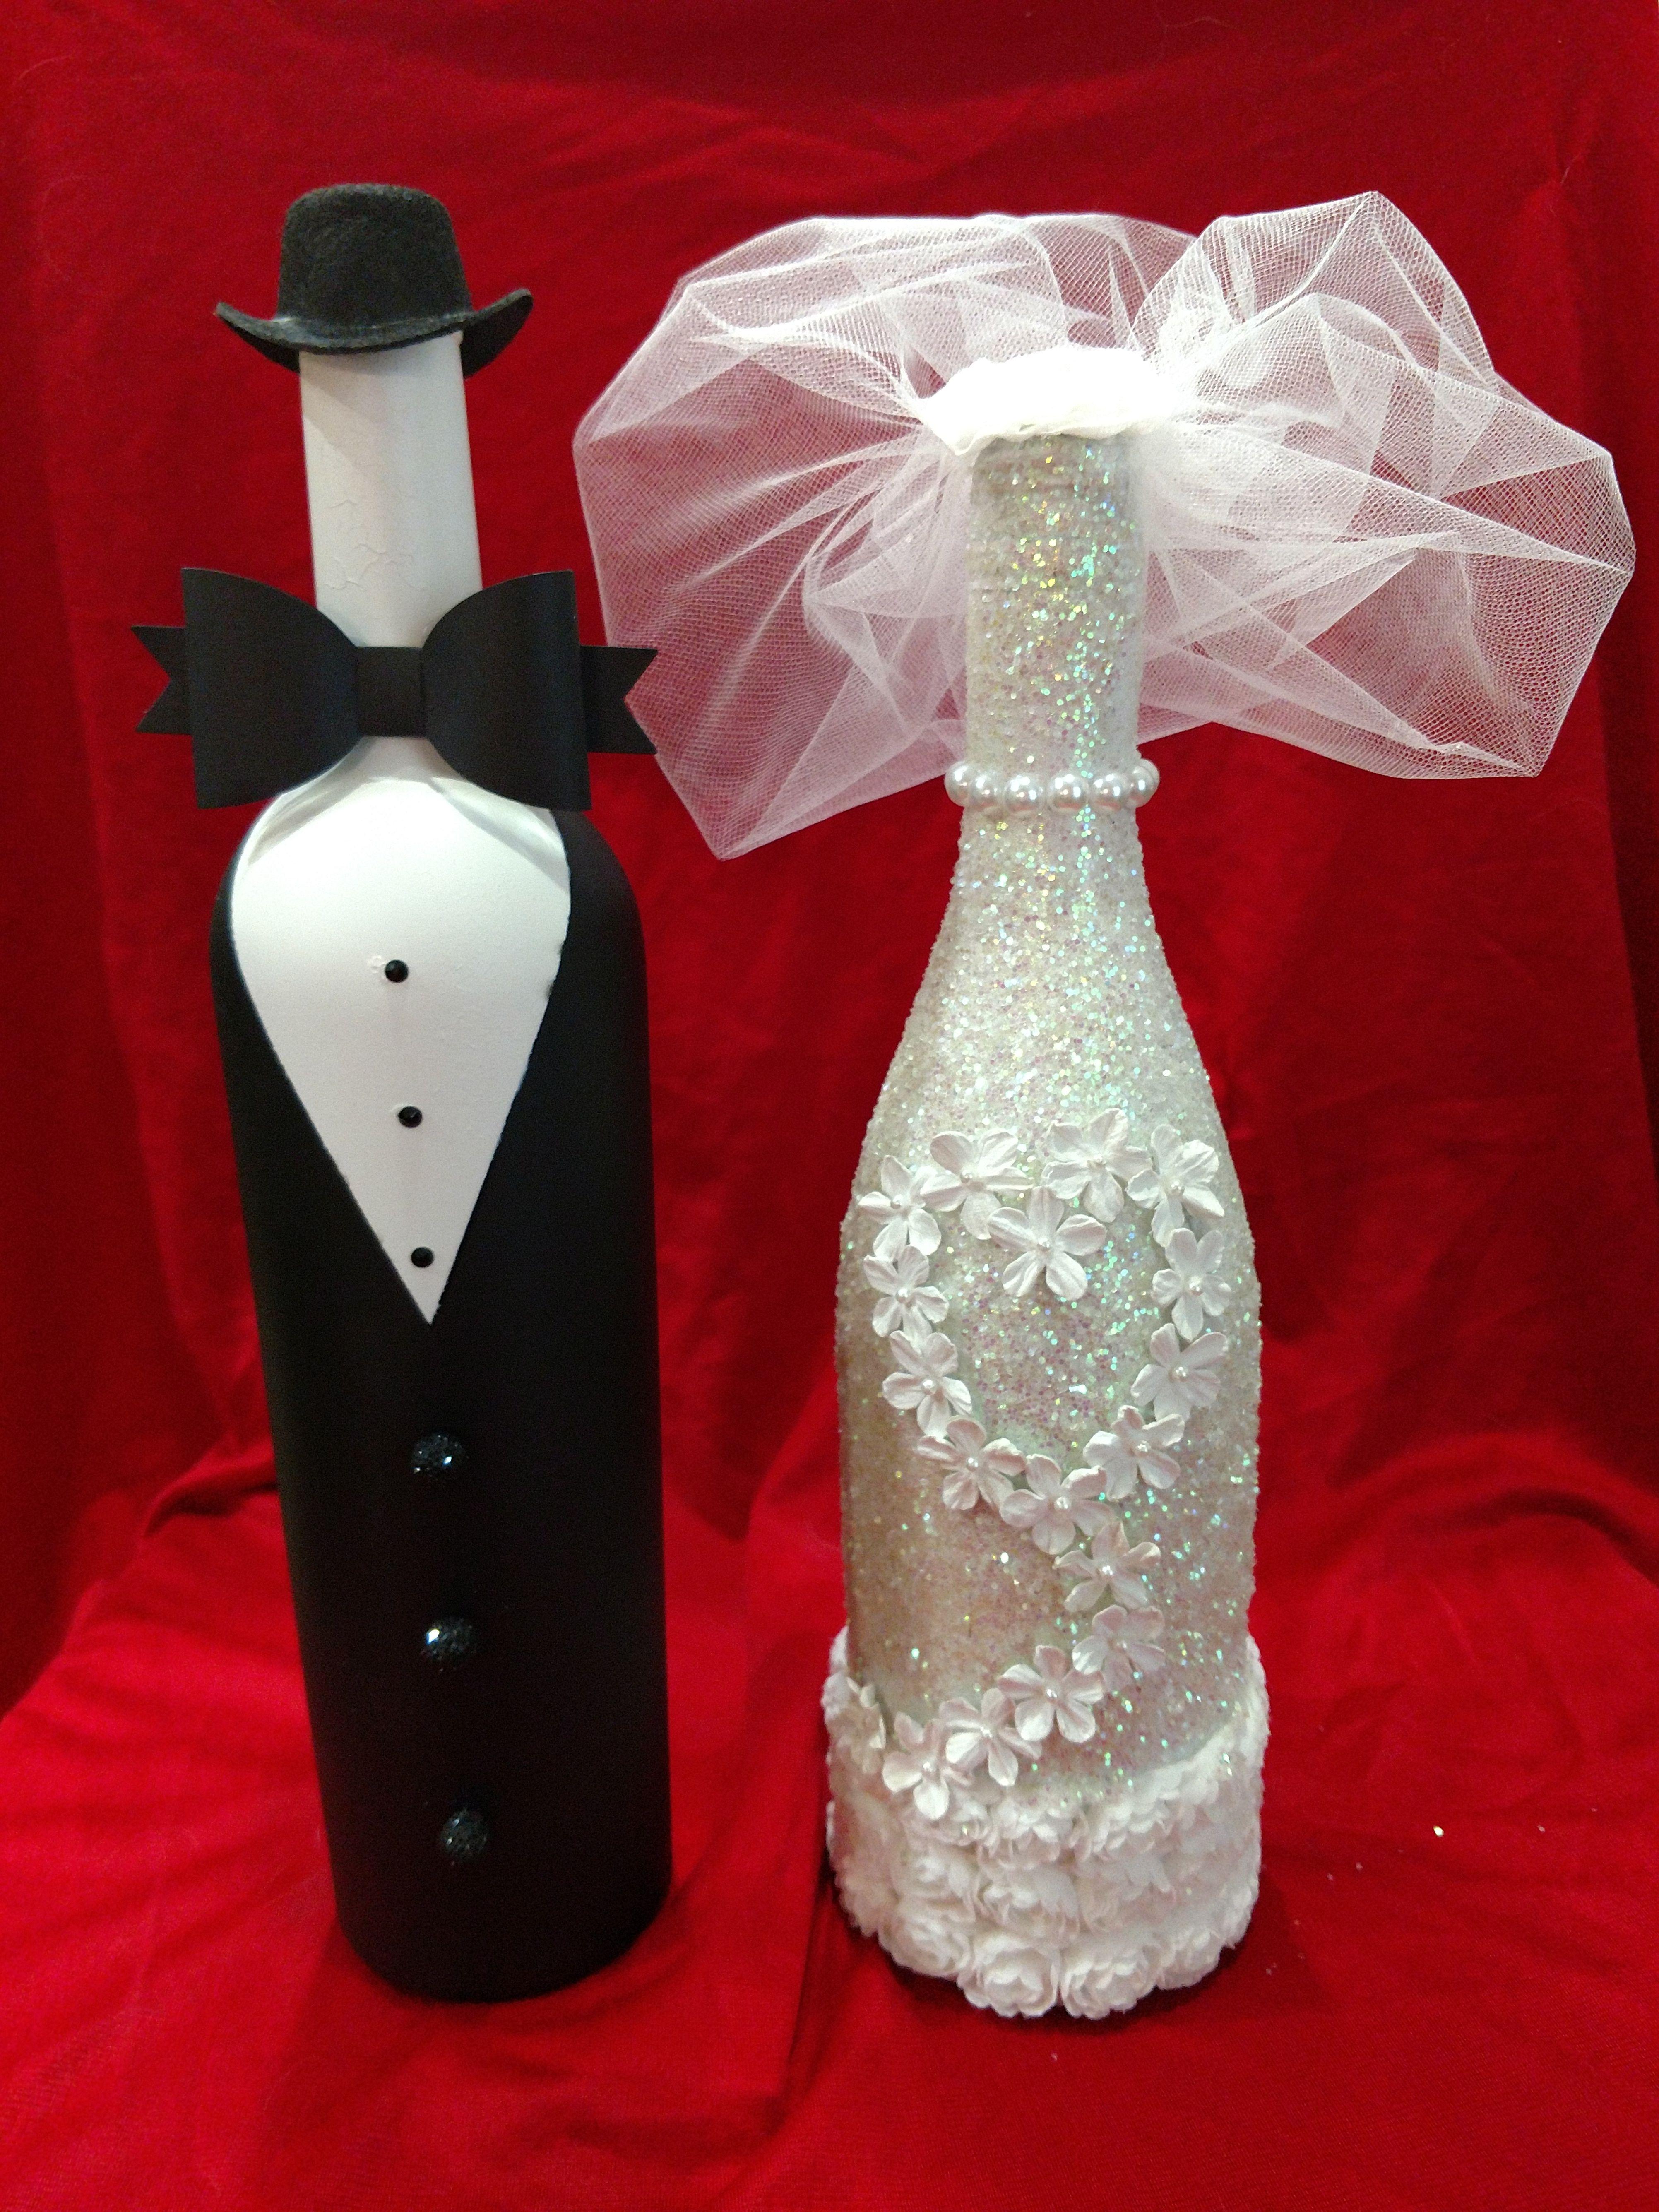 Bride And Groom Wine Bottles Wedding Wine Bottles Liquor Bottle Crafts Wine Bottle Decor